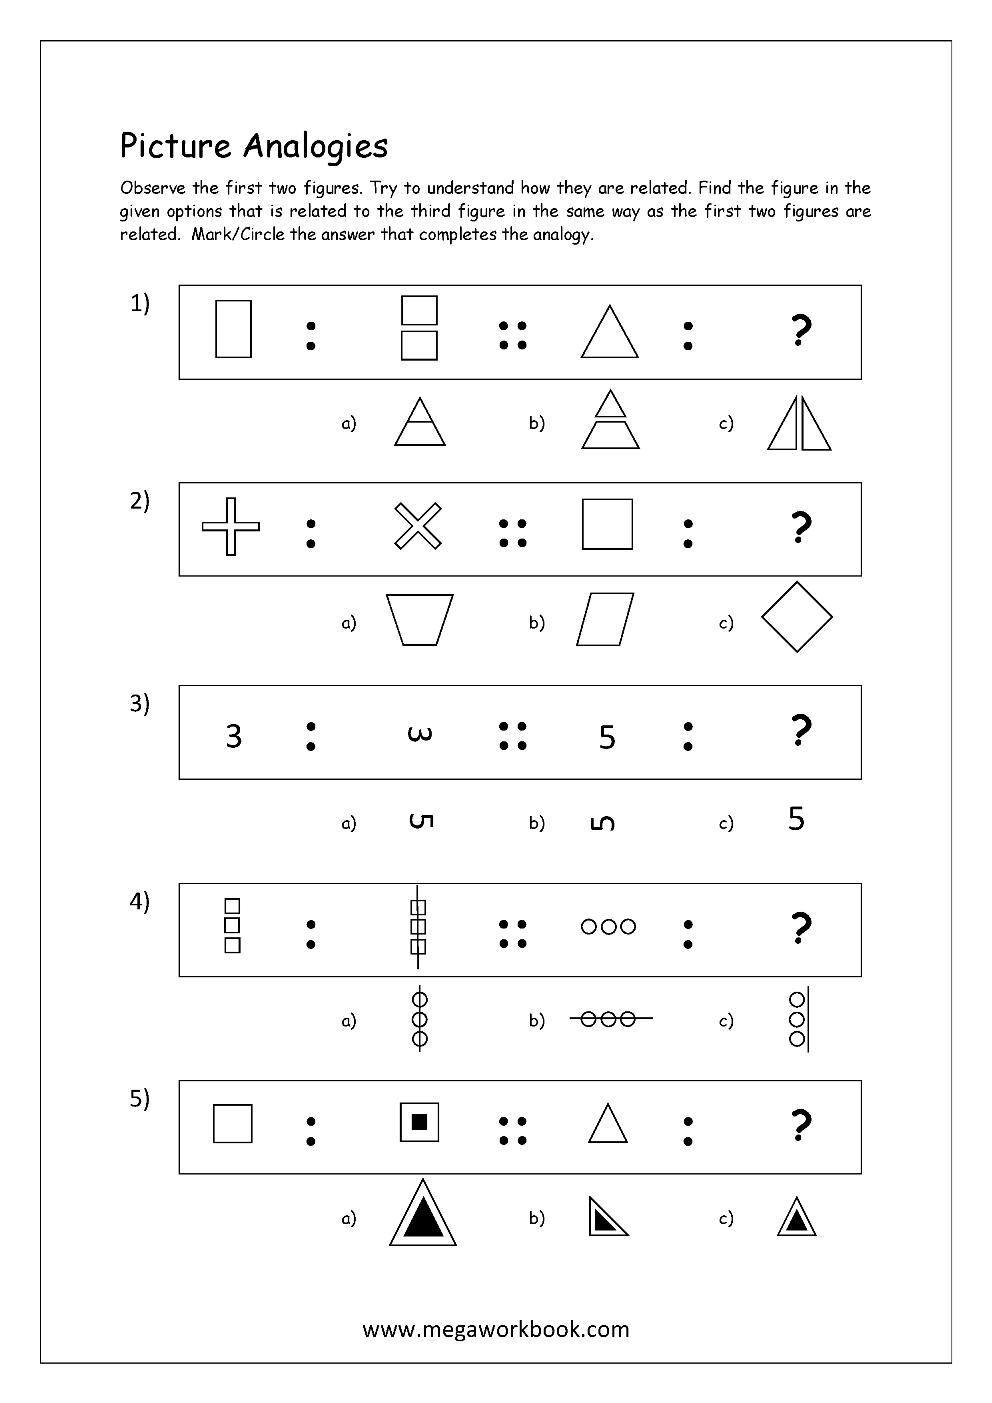 hight resolution of Free Printable Picture Analogy Worksheets - Logical Reasoning - MegaWorkbook